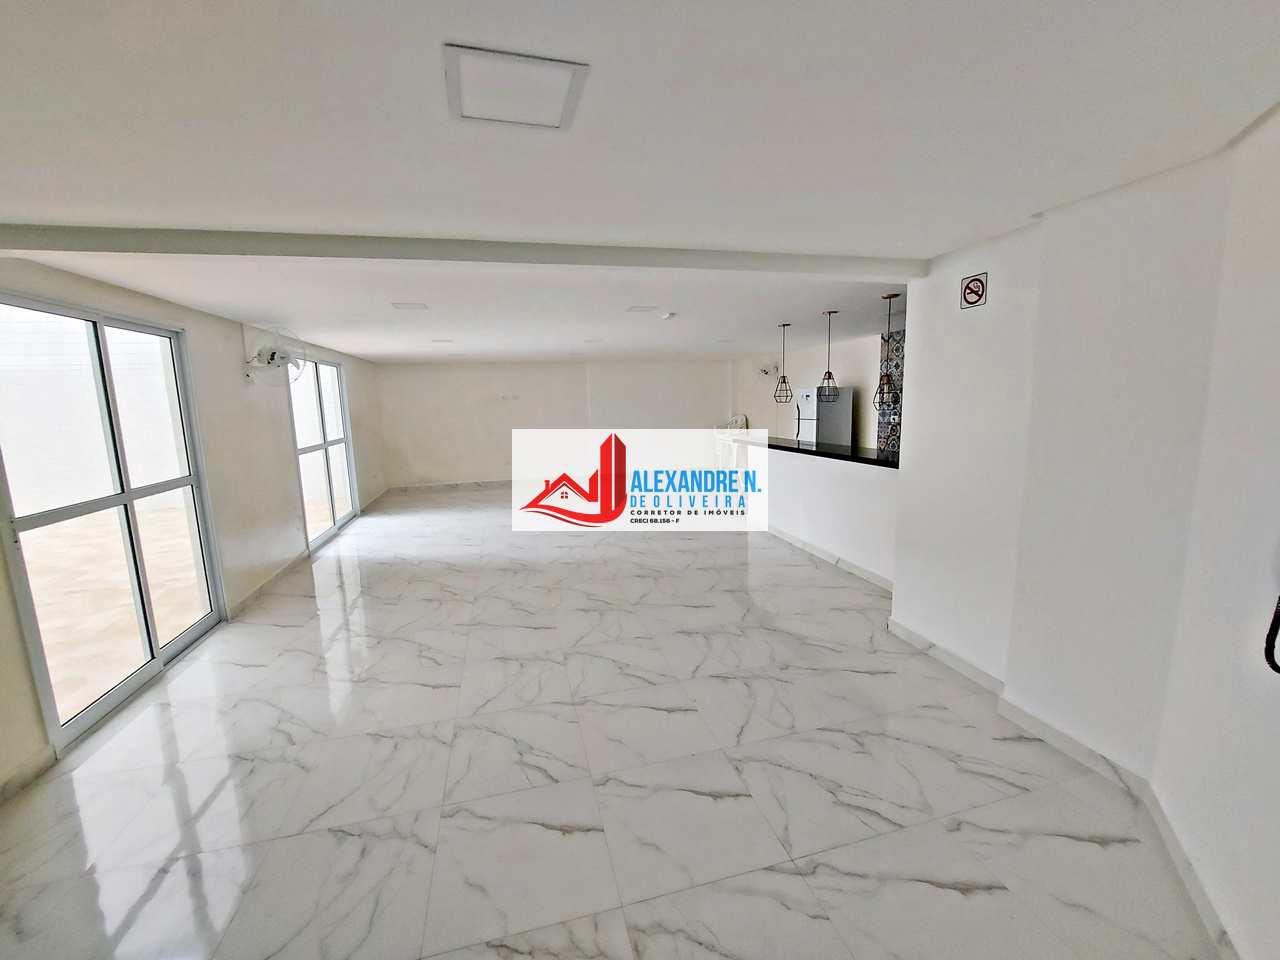 Apartamento 2 dorms, Ocian, Praia Grande - R$ 240 mil, AP00800